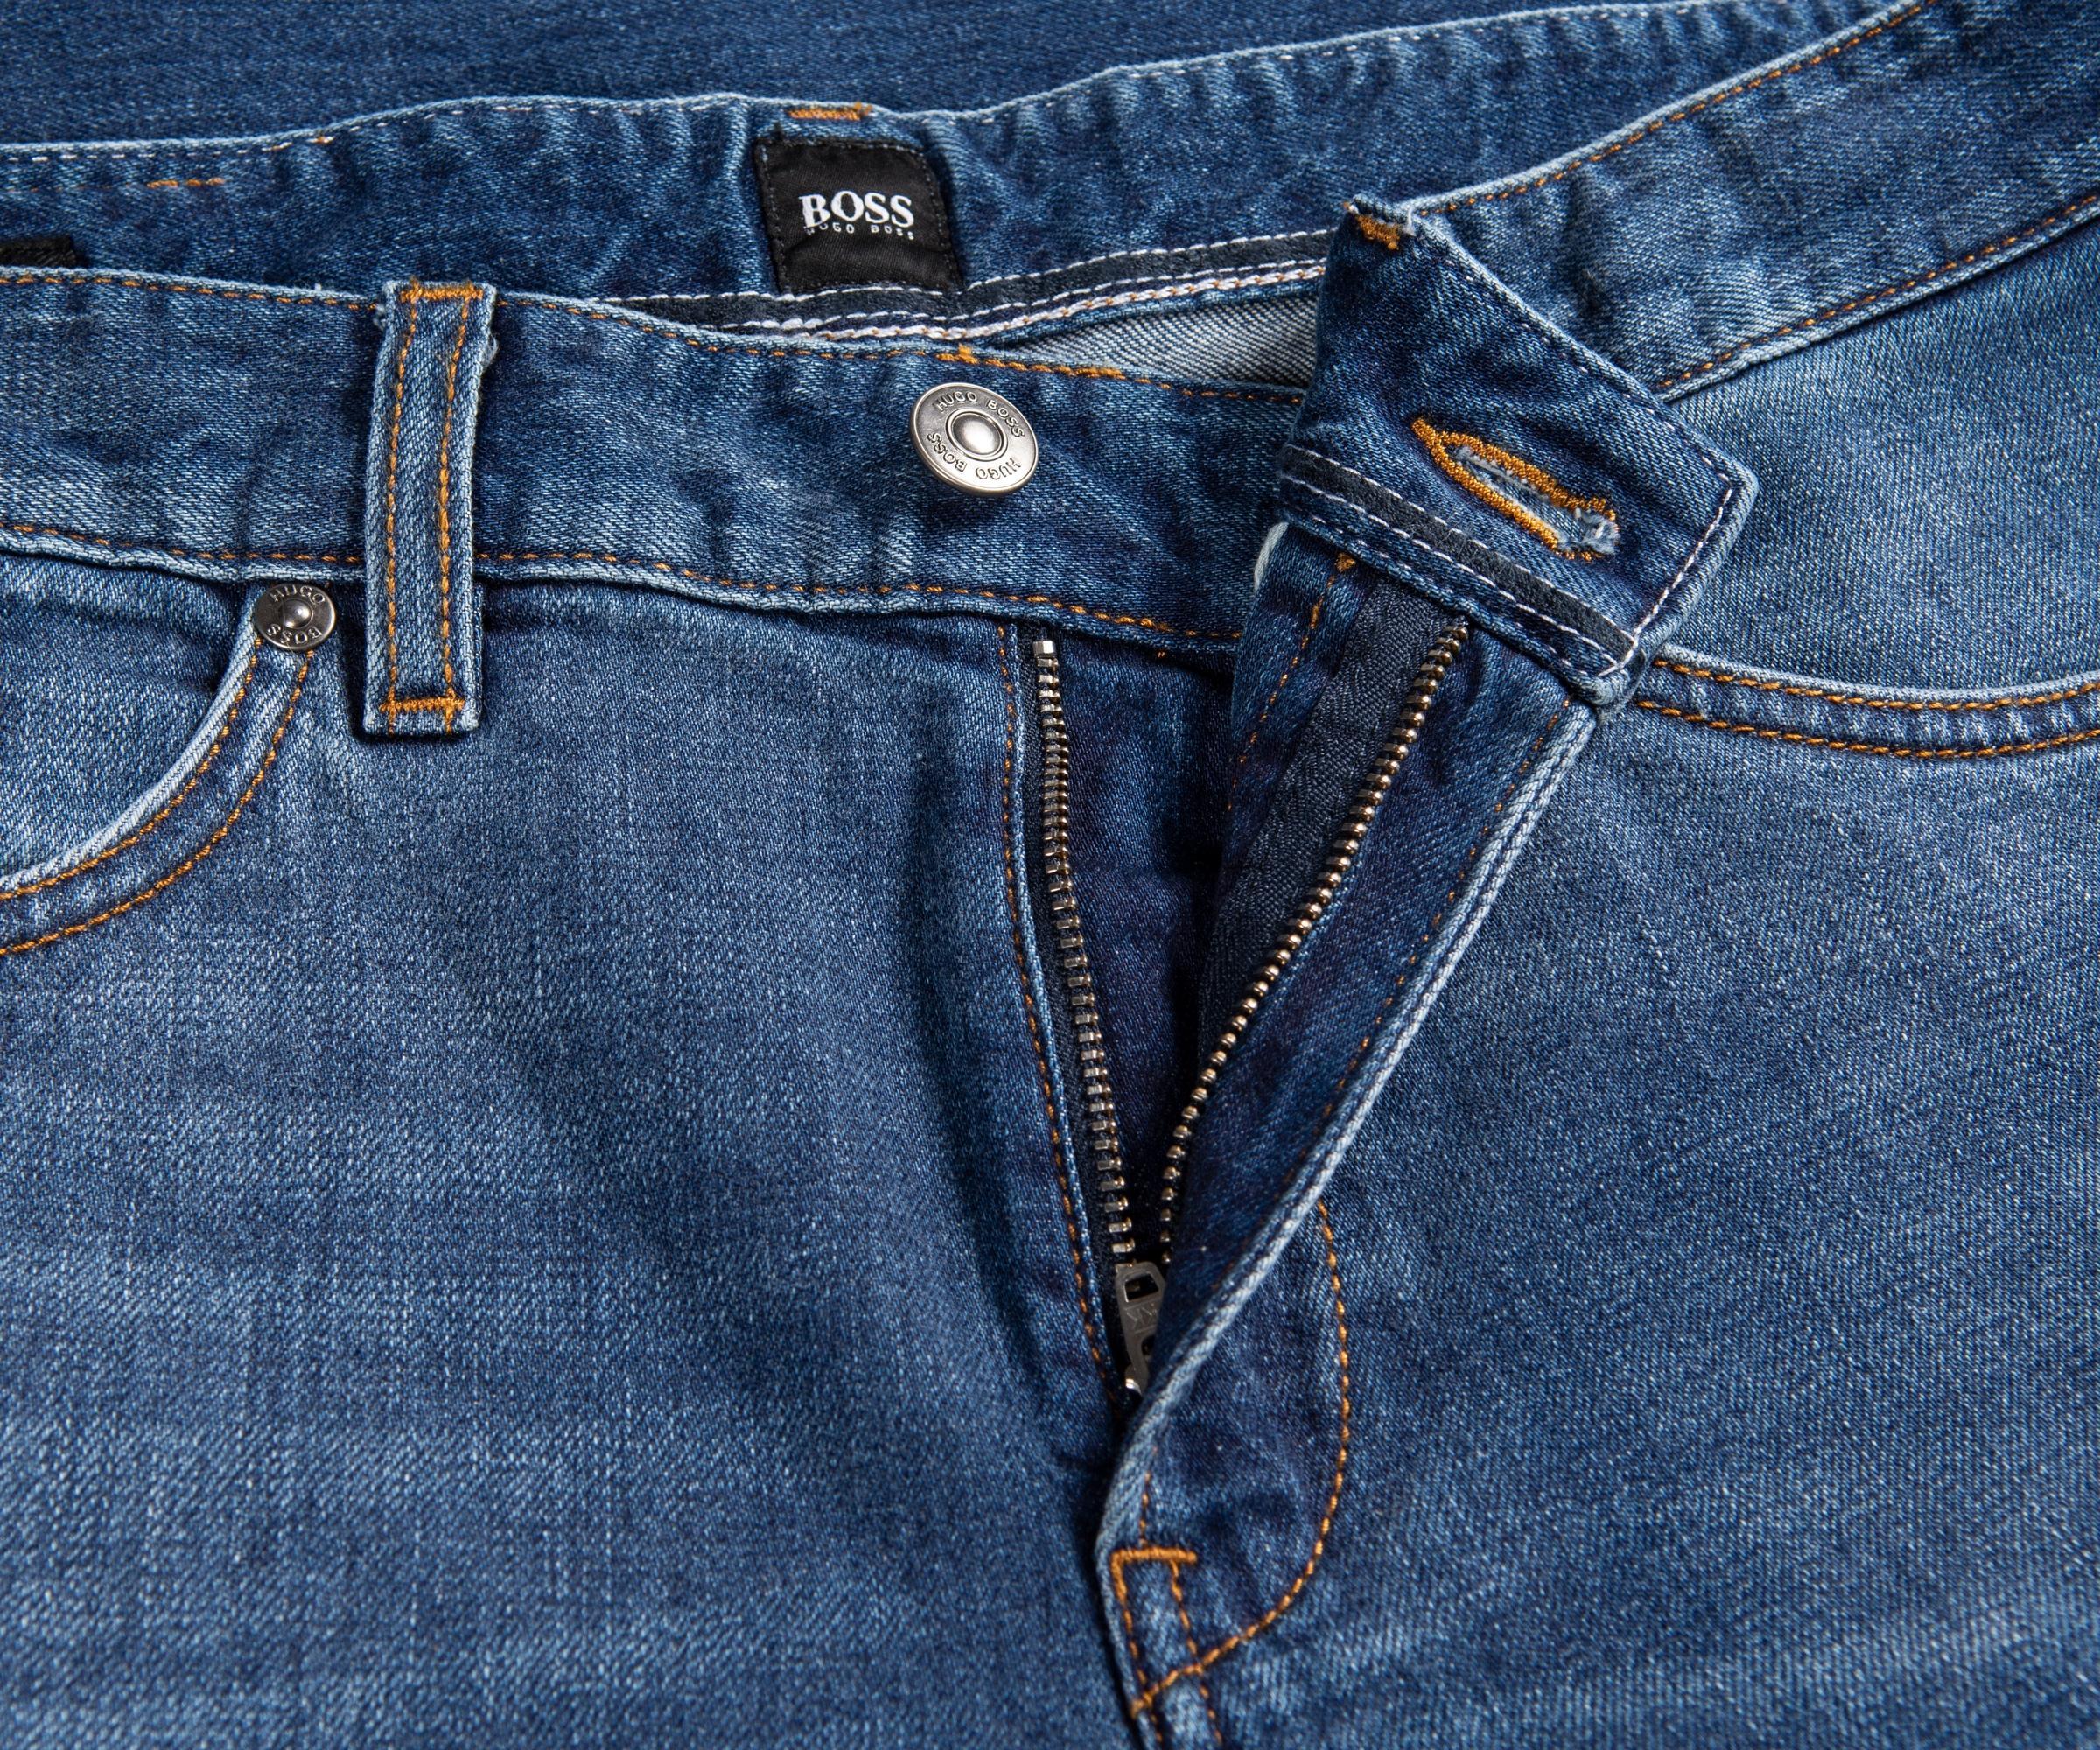 cca7f9ad BOSS - 'delaware 3-1' Slim Fit Jeans Summer Wash Blue for Men. View  fullscreen